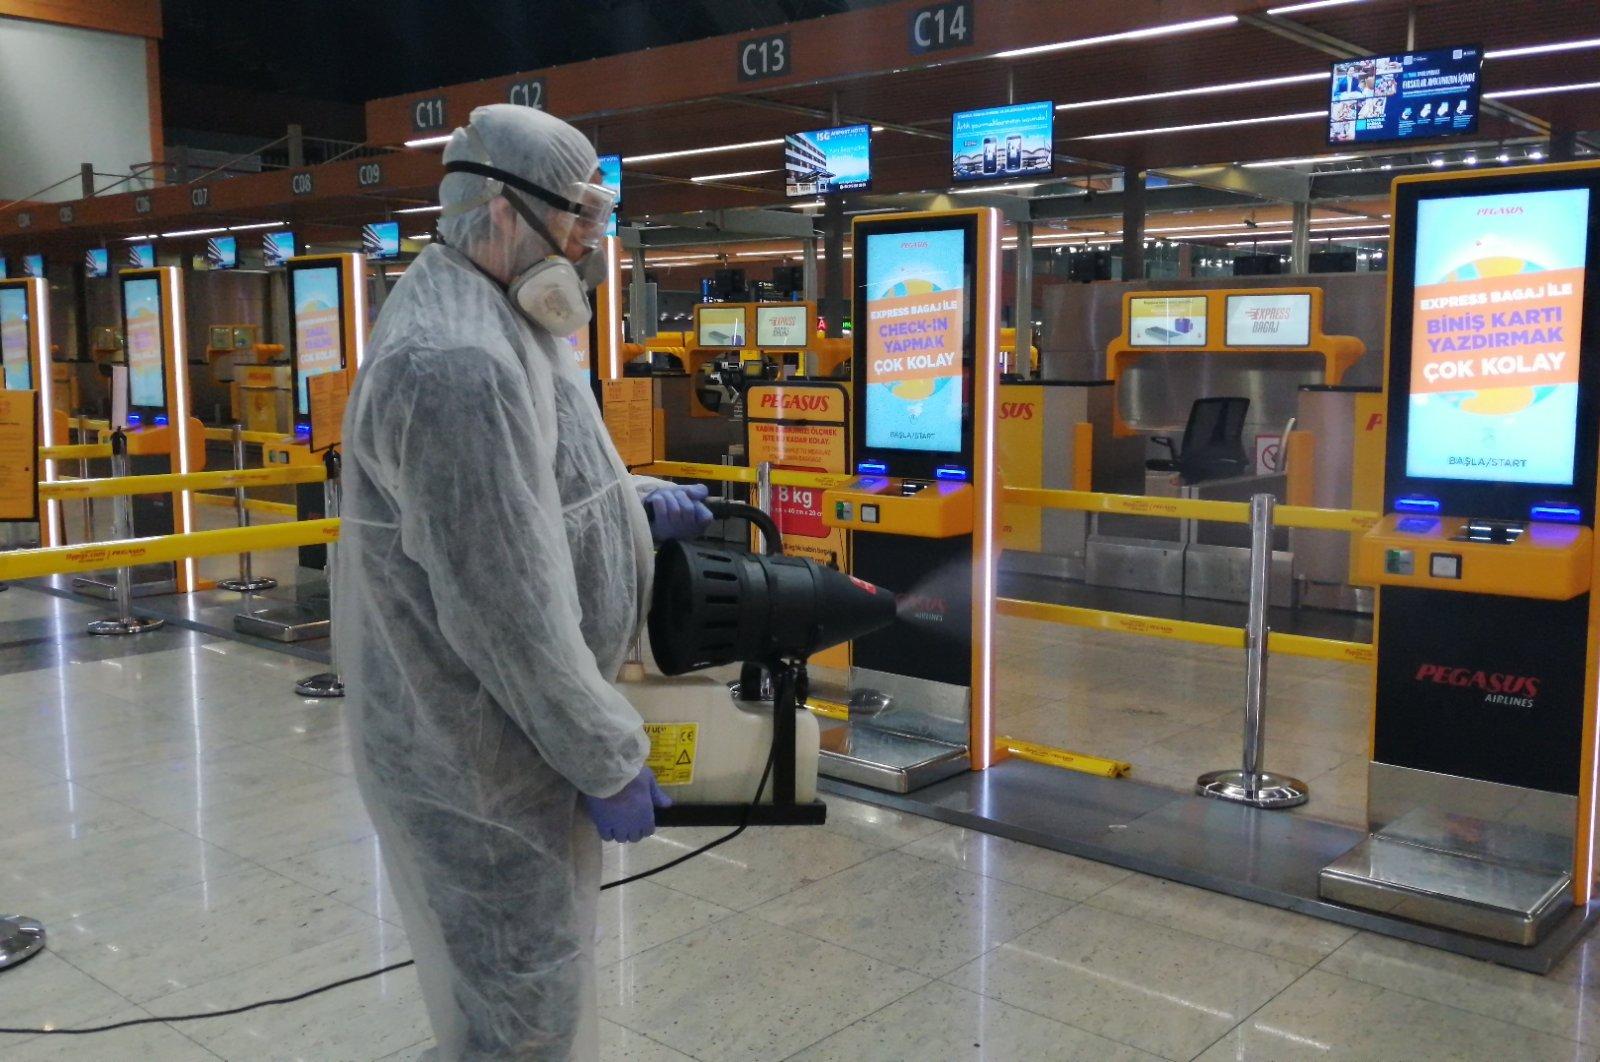 A worker sprays disinfectant at Sabiha Gökçen International Airport, Istanbul, Turkey, in this undated photo. (Courtesy of Sabiha Gökçen International Airport)